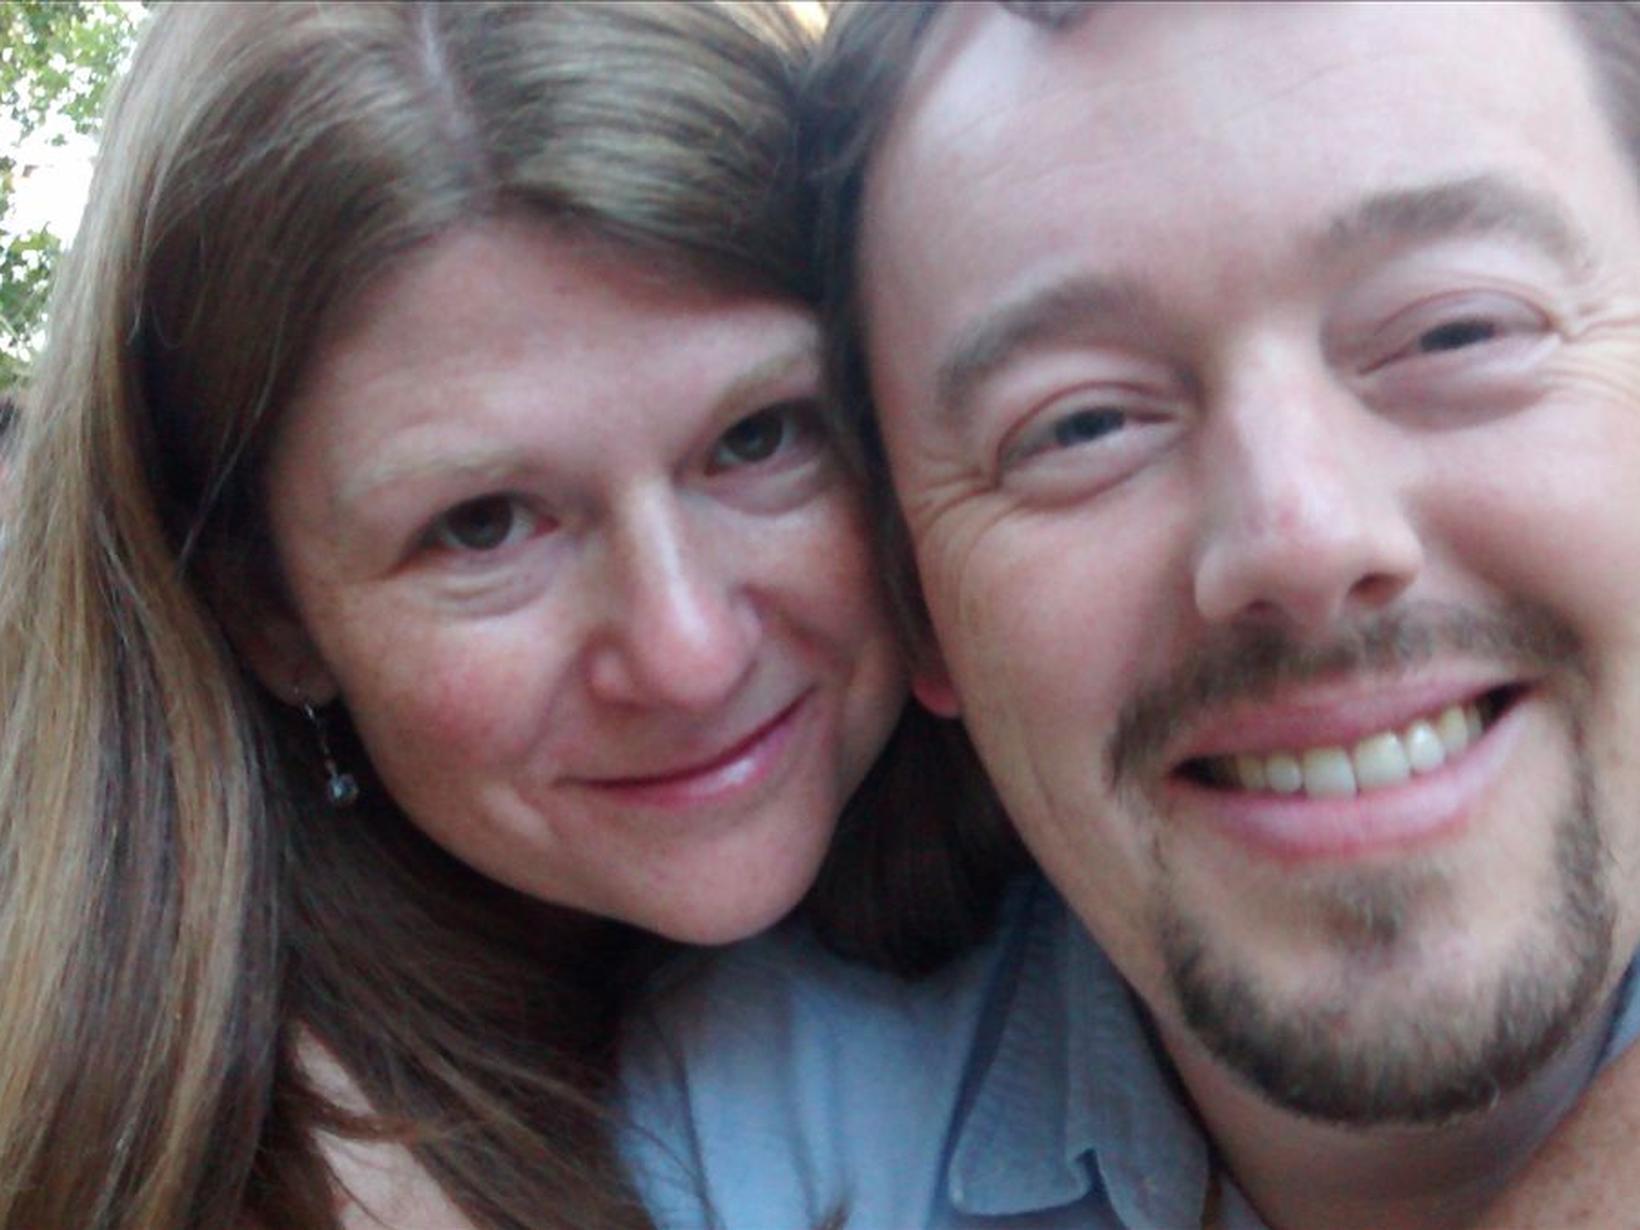 Paul & Nadine from Toronto, Ontario, Canada